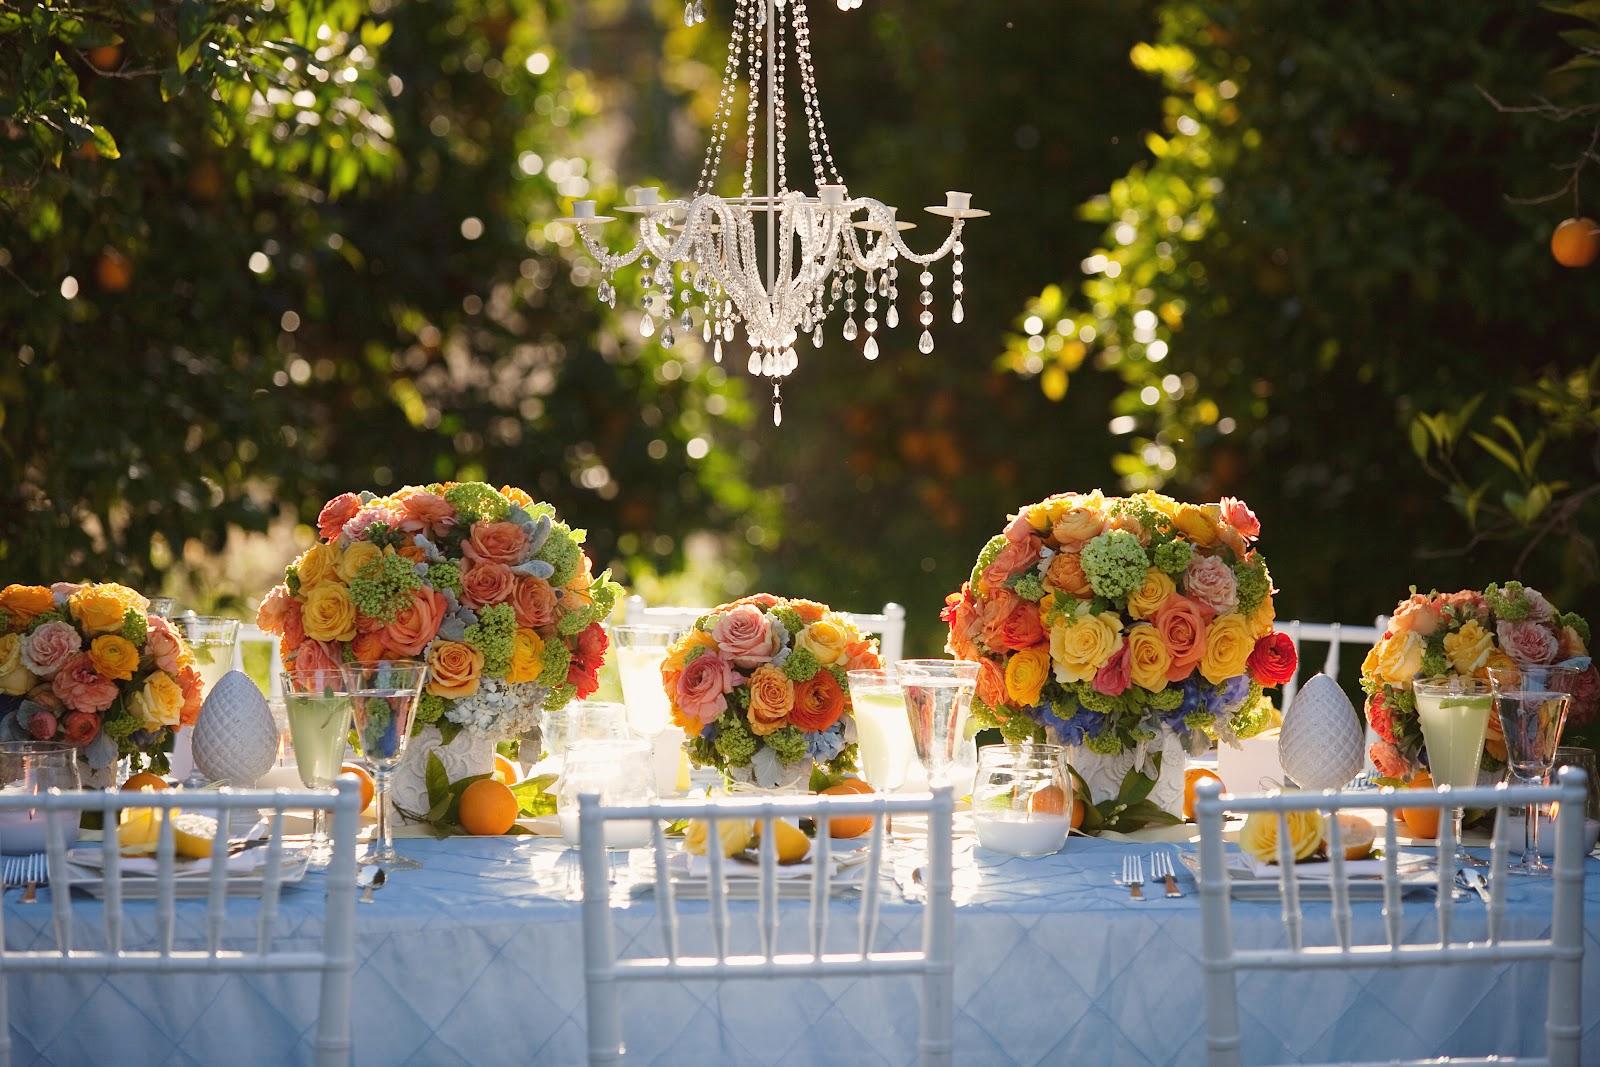 Orchard Wedding - Citrus Wedding Colors